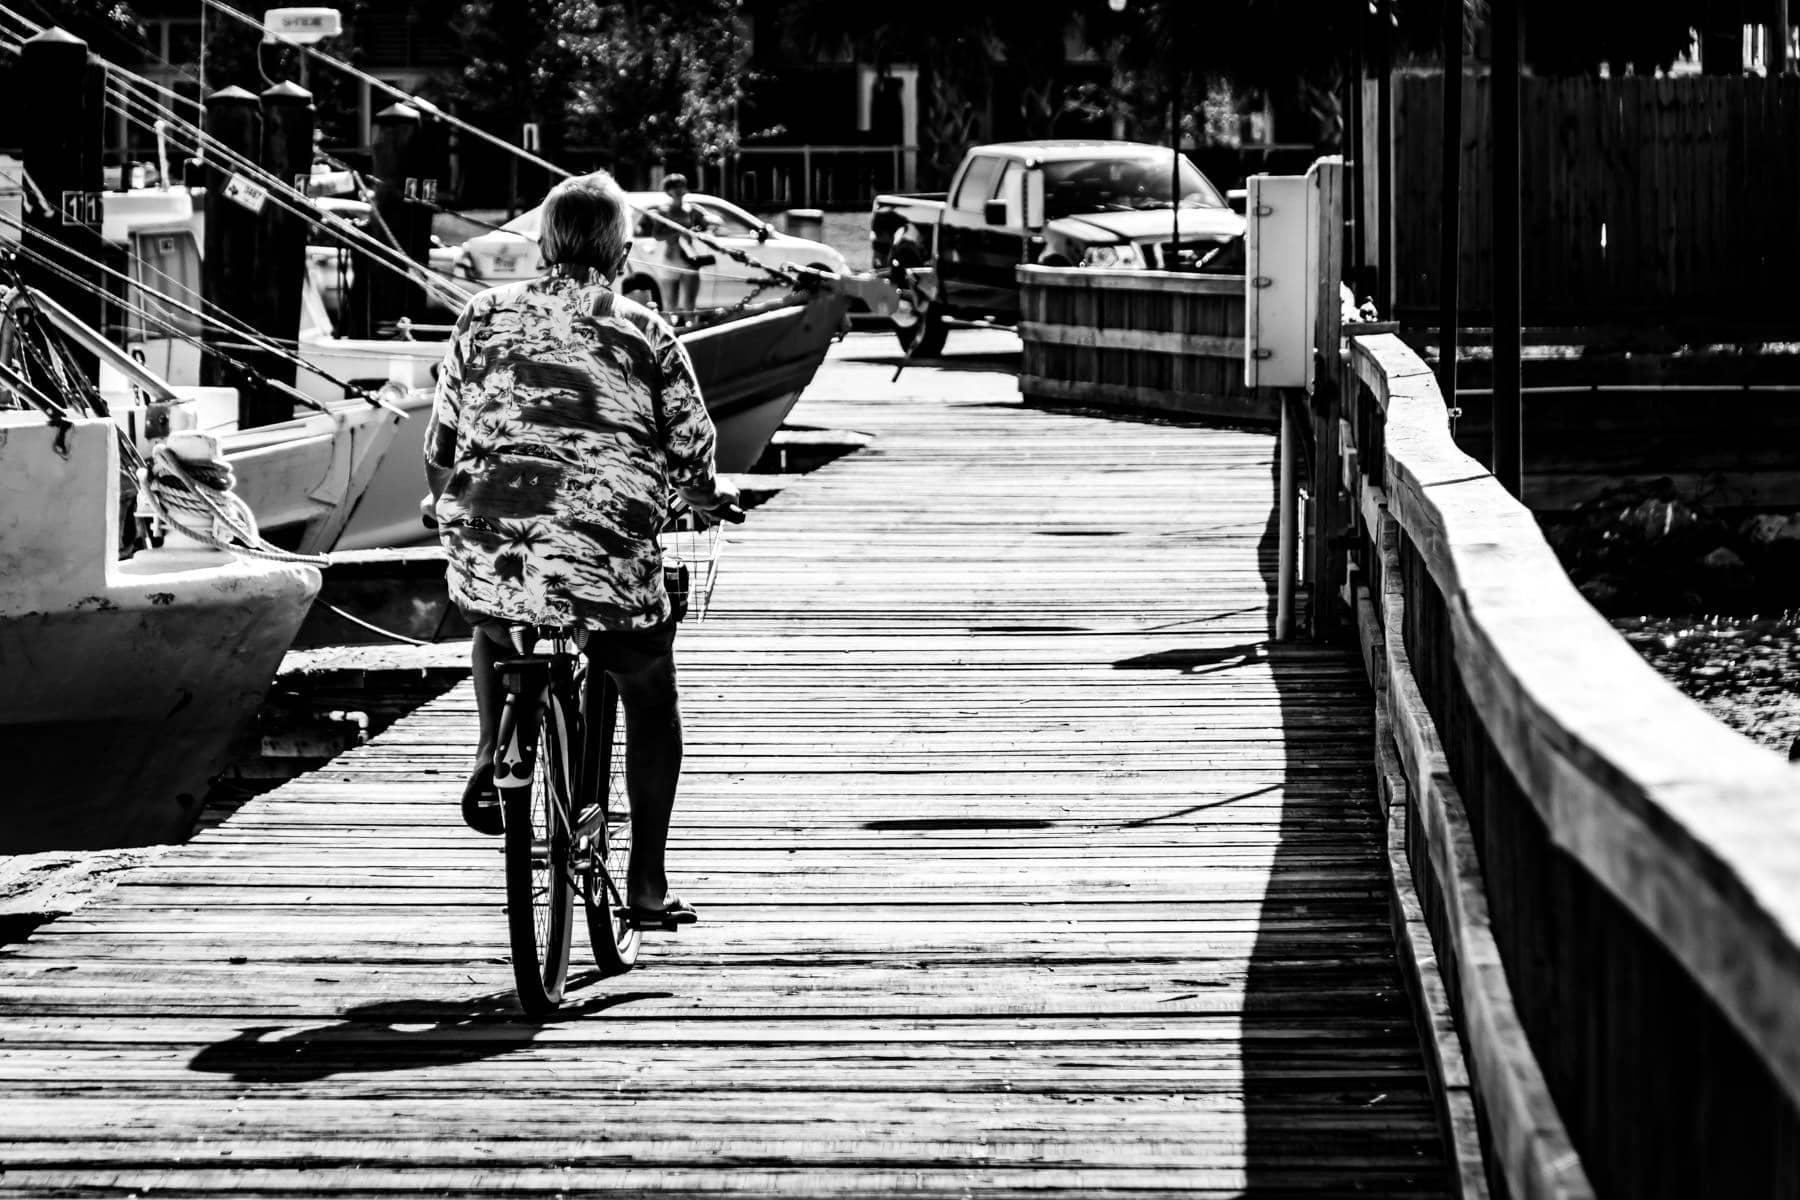 A Hawaiian-shirted gentleman rides a bike along a pier in Galveston, Texas.